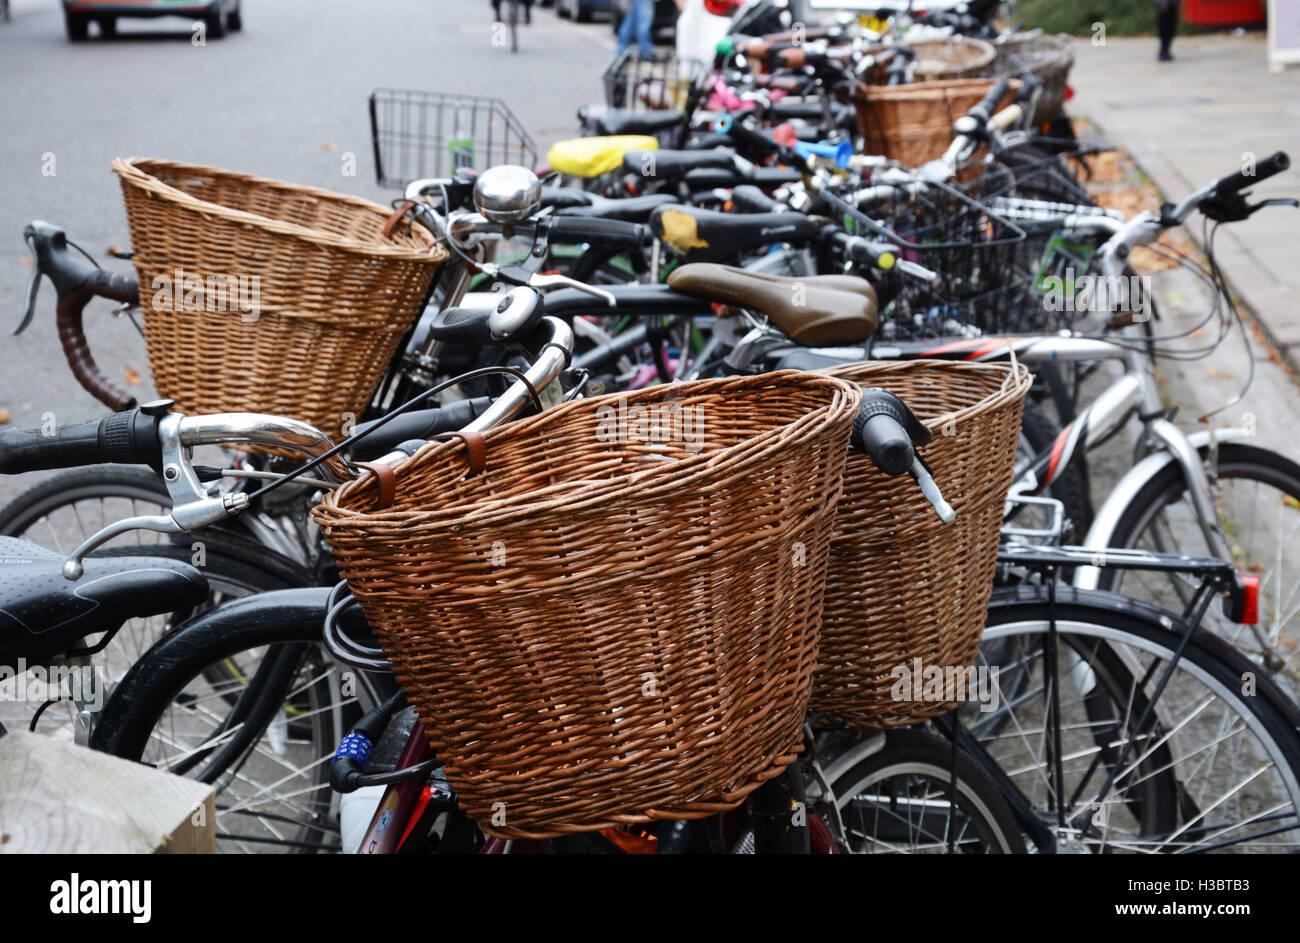 Bikes, bicycles, in Cambridge, England. - Stock Image